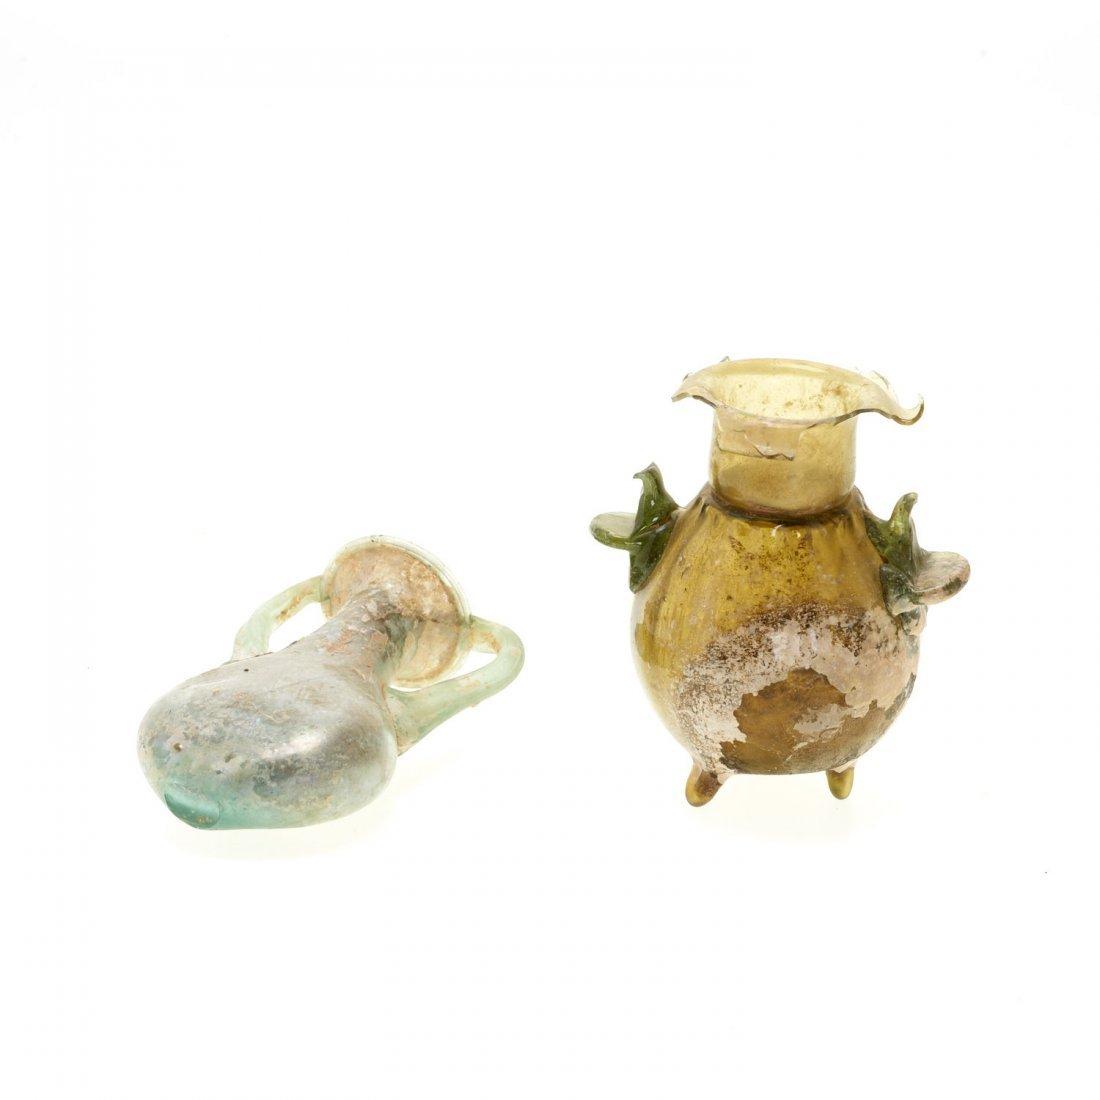 (4) Ancient Roman glass articles - 2